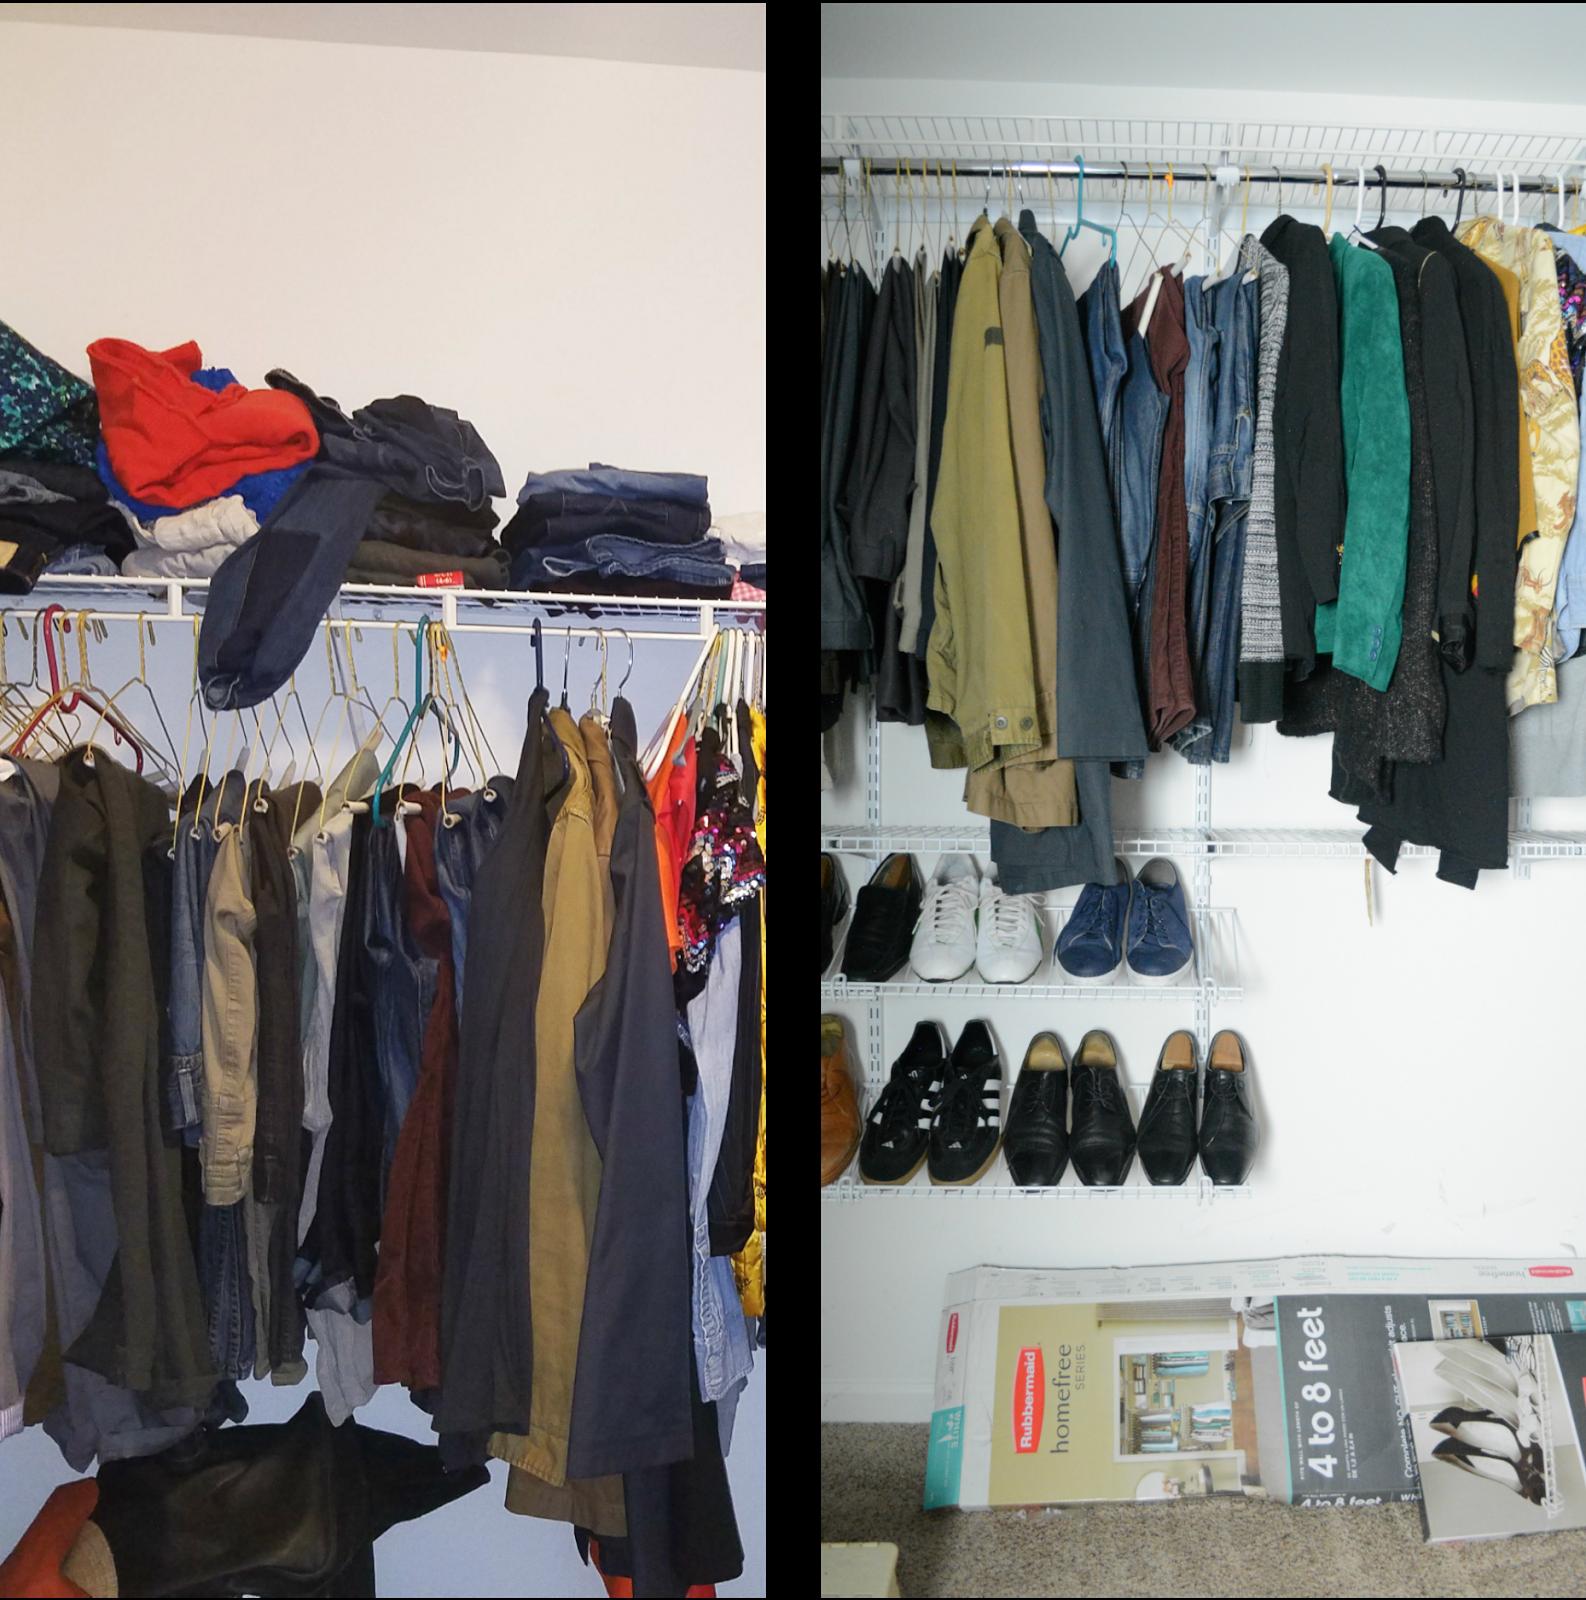 storage for closet the system organization organized organizational rubbermaid using fast fasttrack ideas garage getting in track